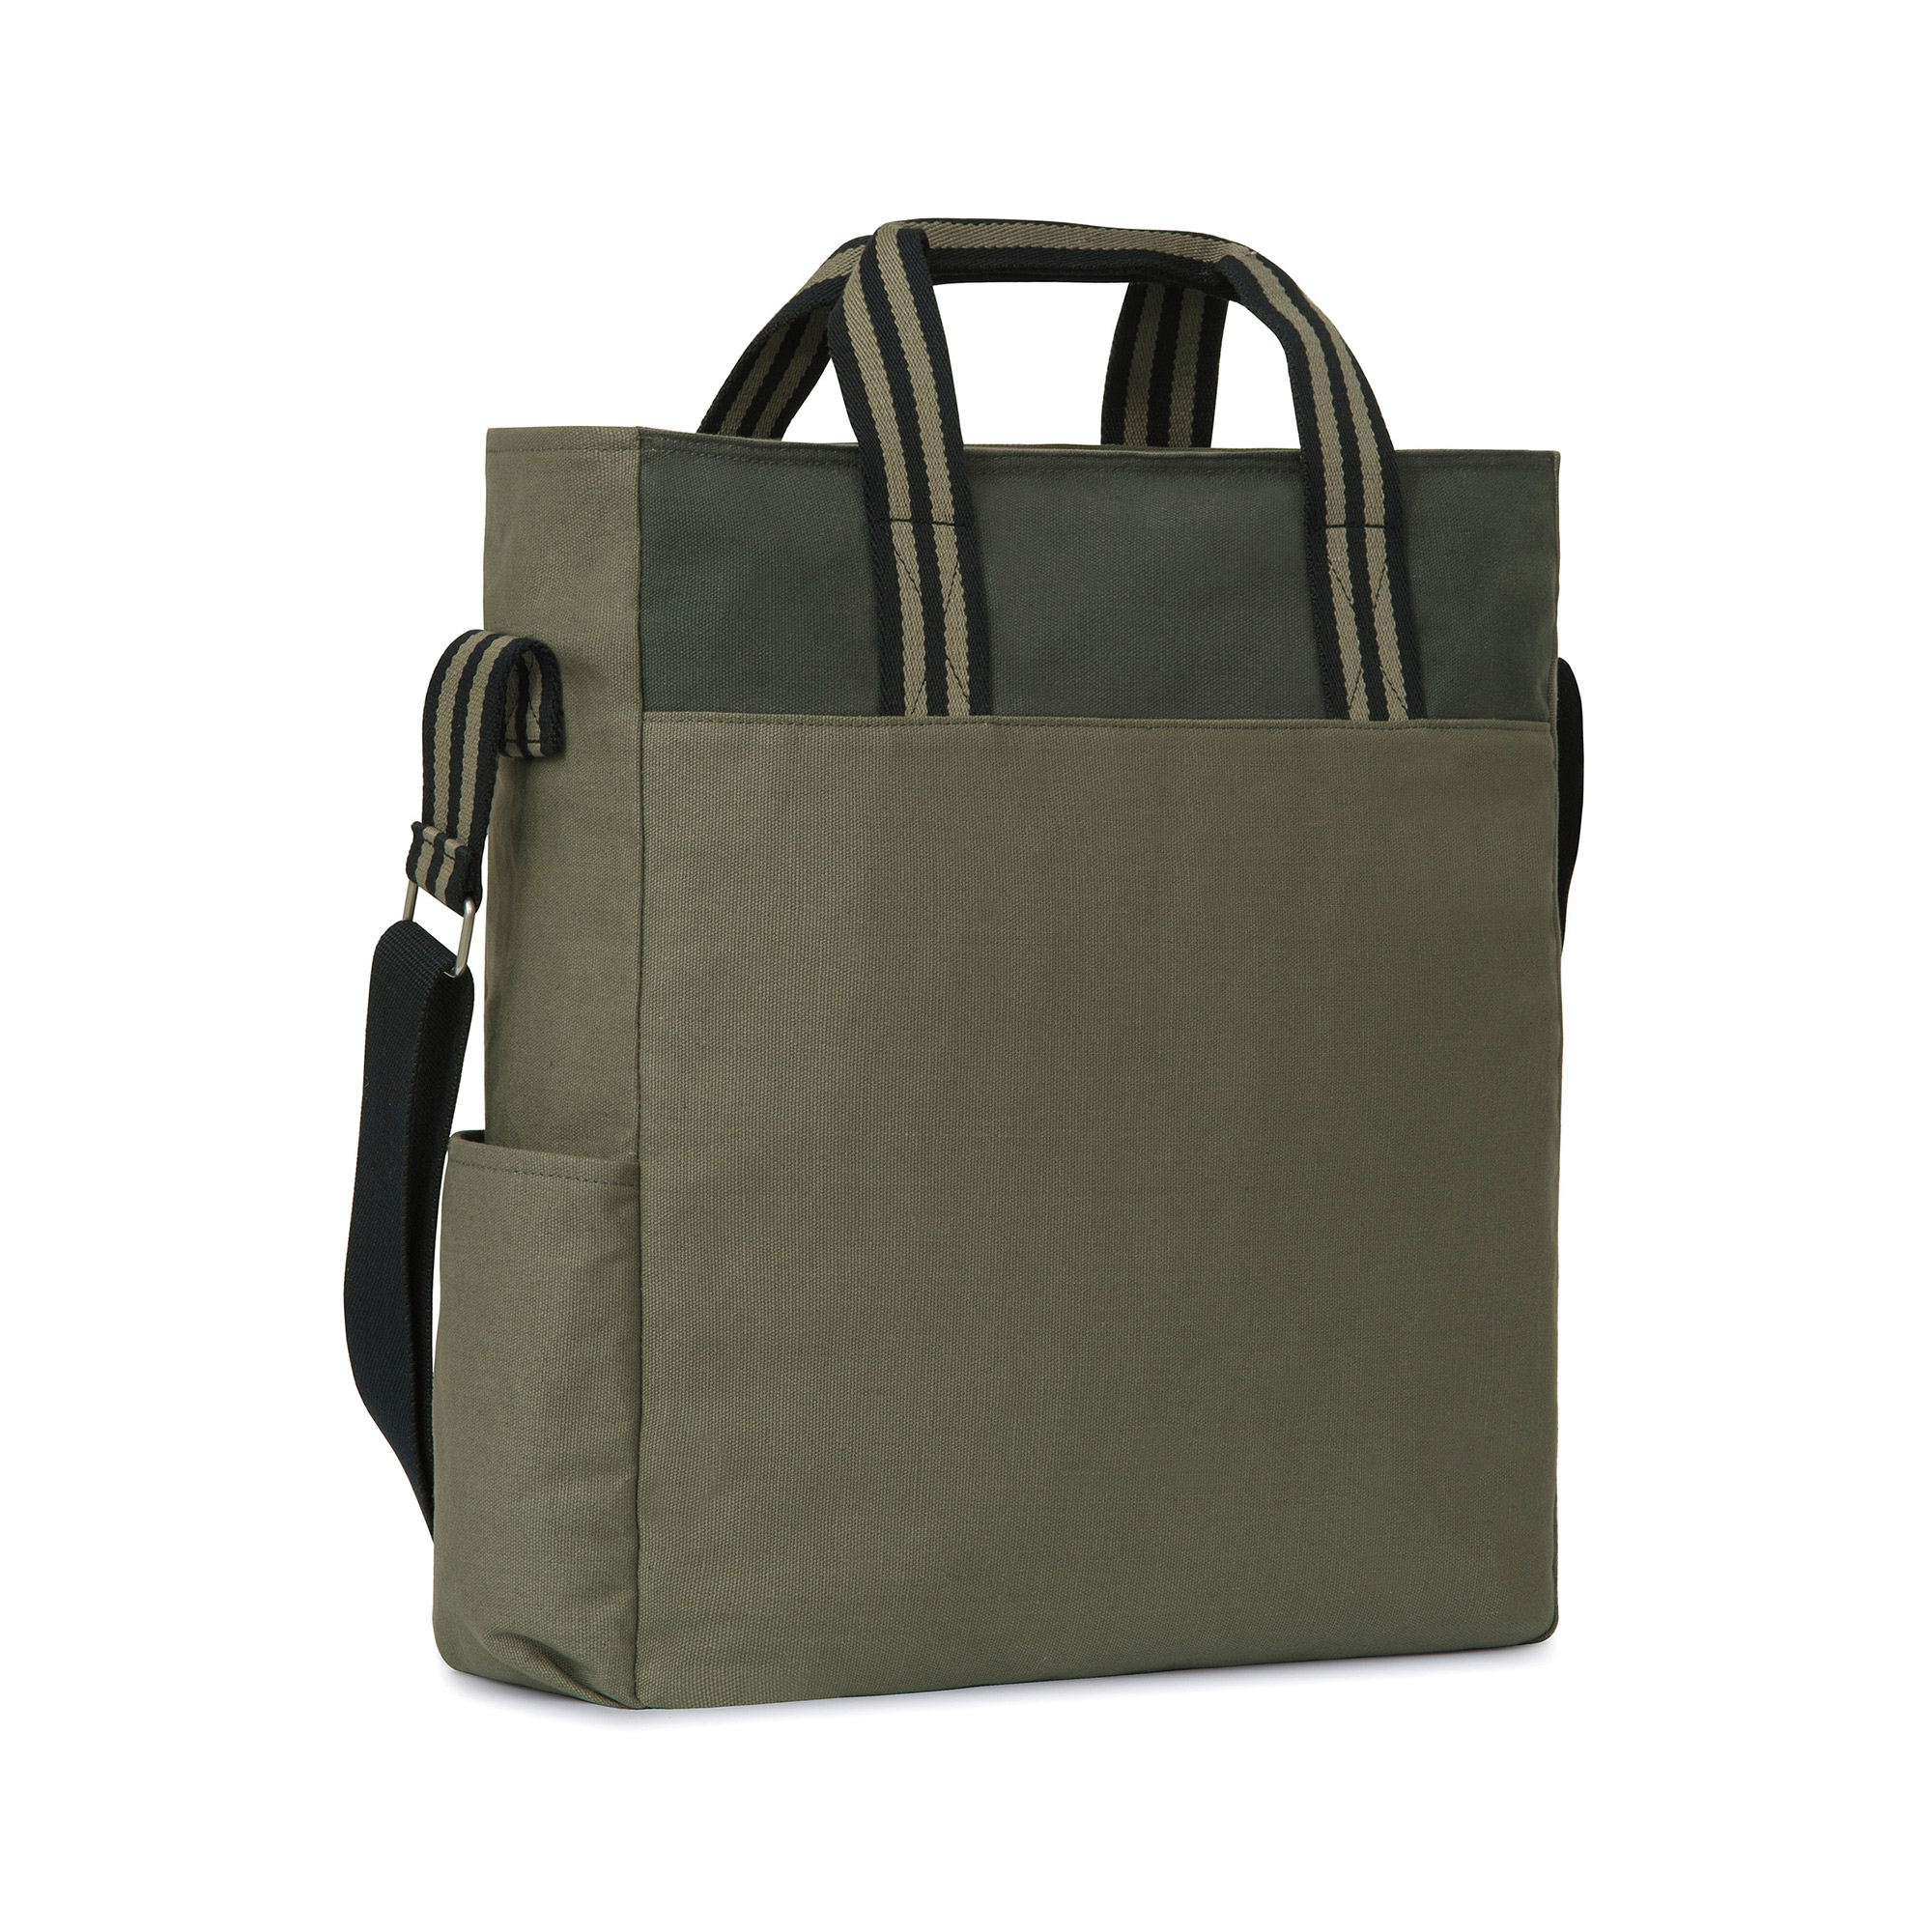 Adjustable shoulder strap, top zipper closure, and a side bottle pocket. (Loden and Deep Forest colorway)